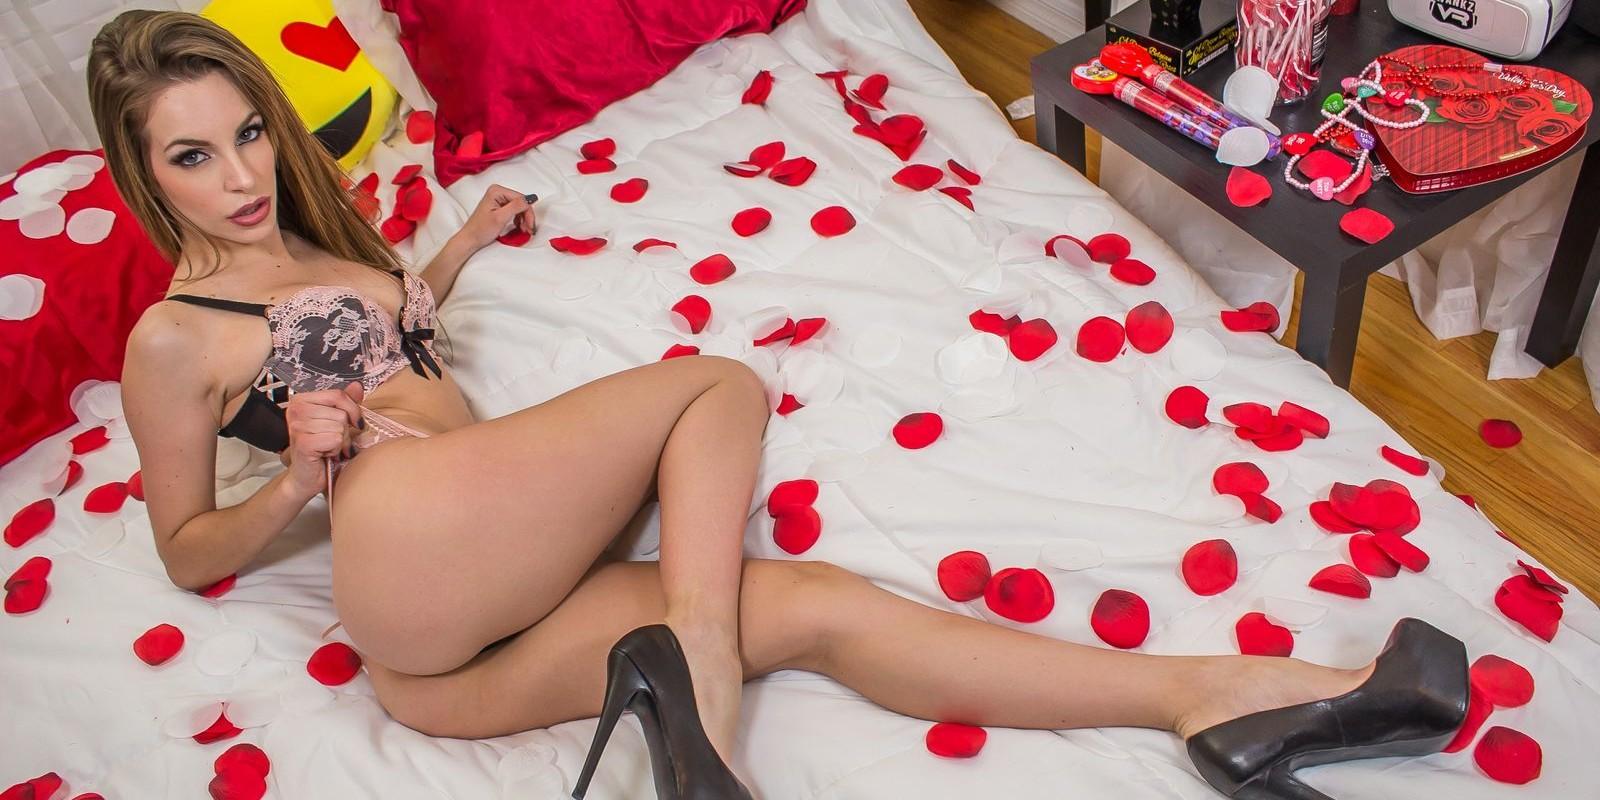 Kimmy Granger Experience - Valentine's Day wankzvr vr porn blog virtual reality